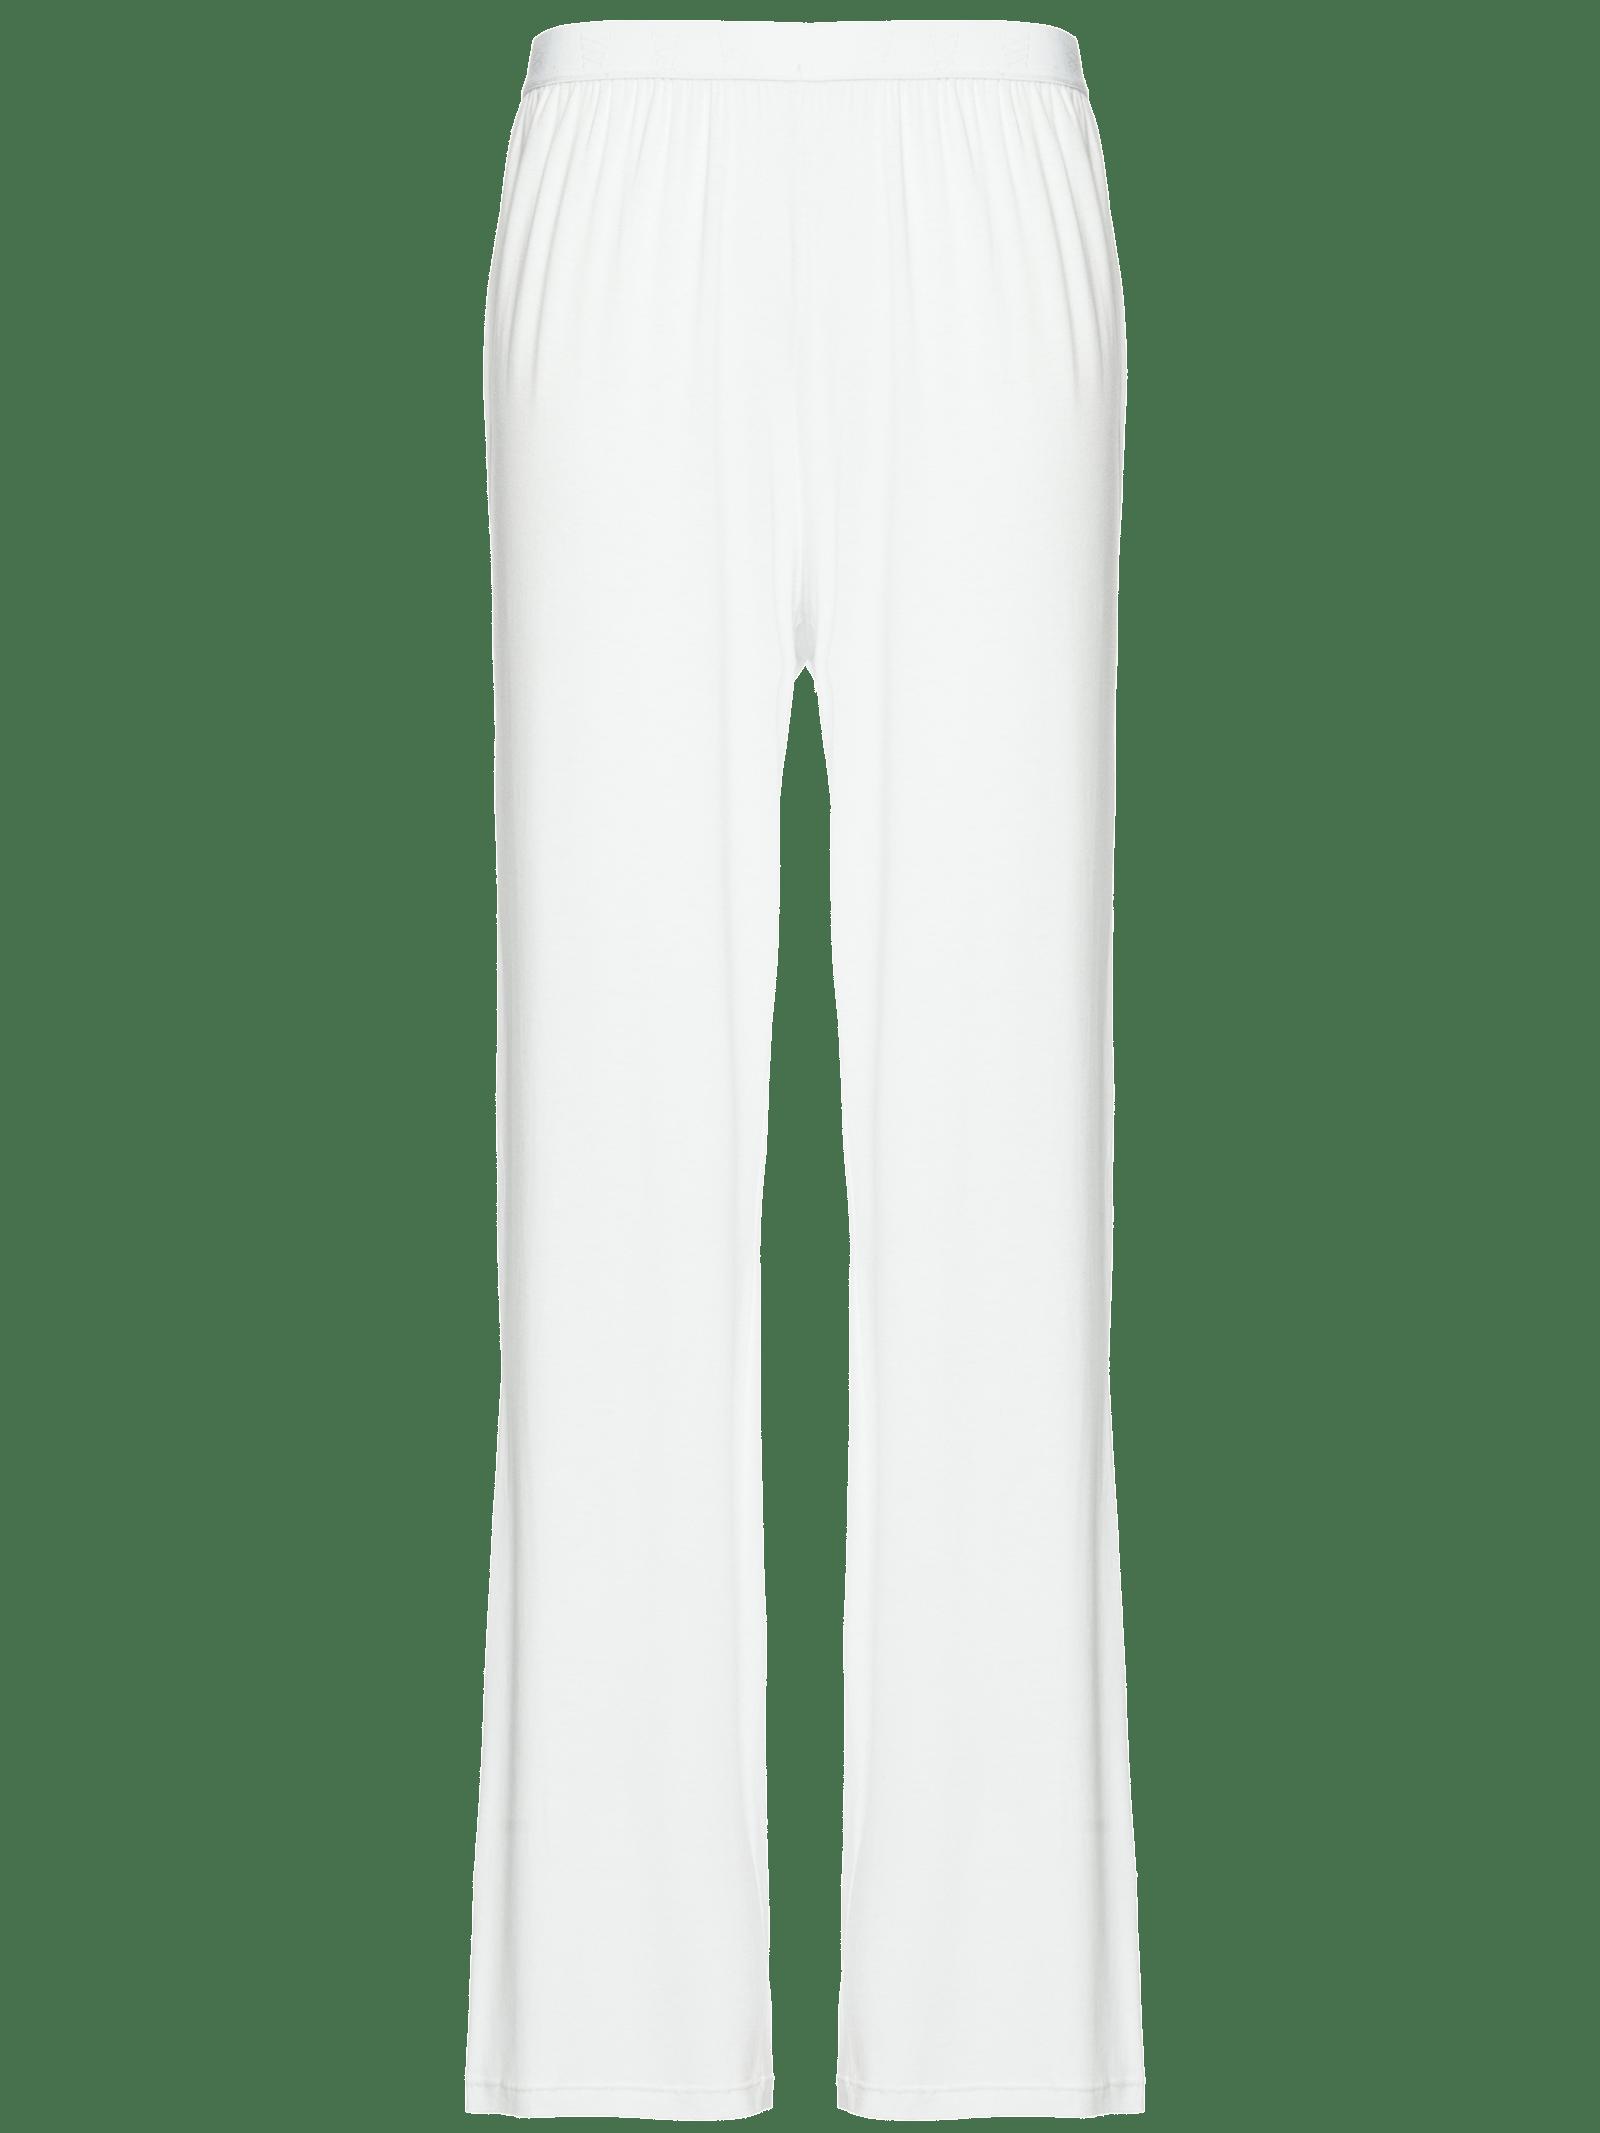 25010046_001_1-CALCA-VISCOLYCRA-BASIC-LOUNGE